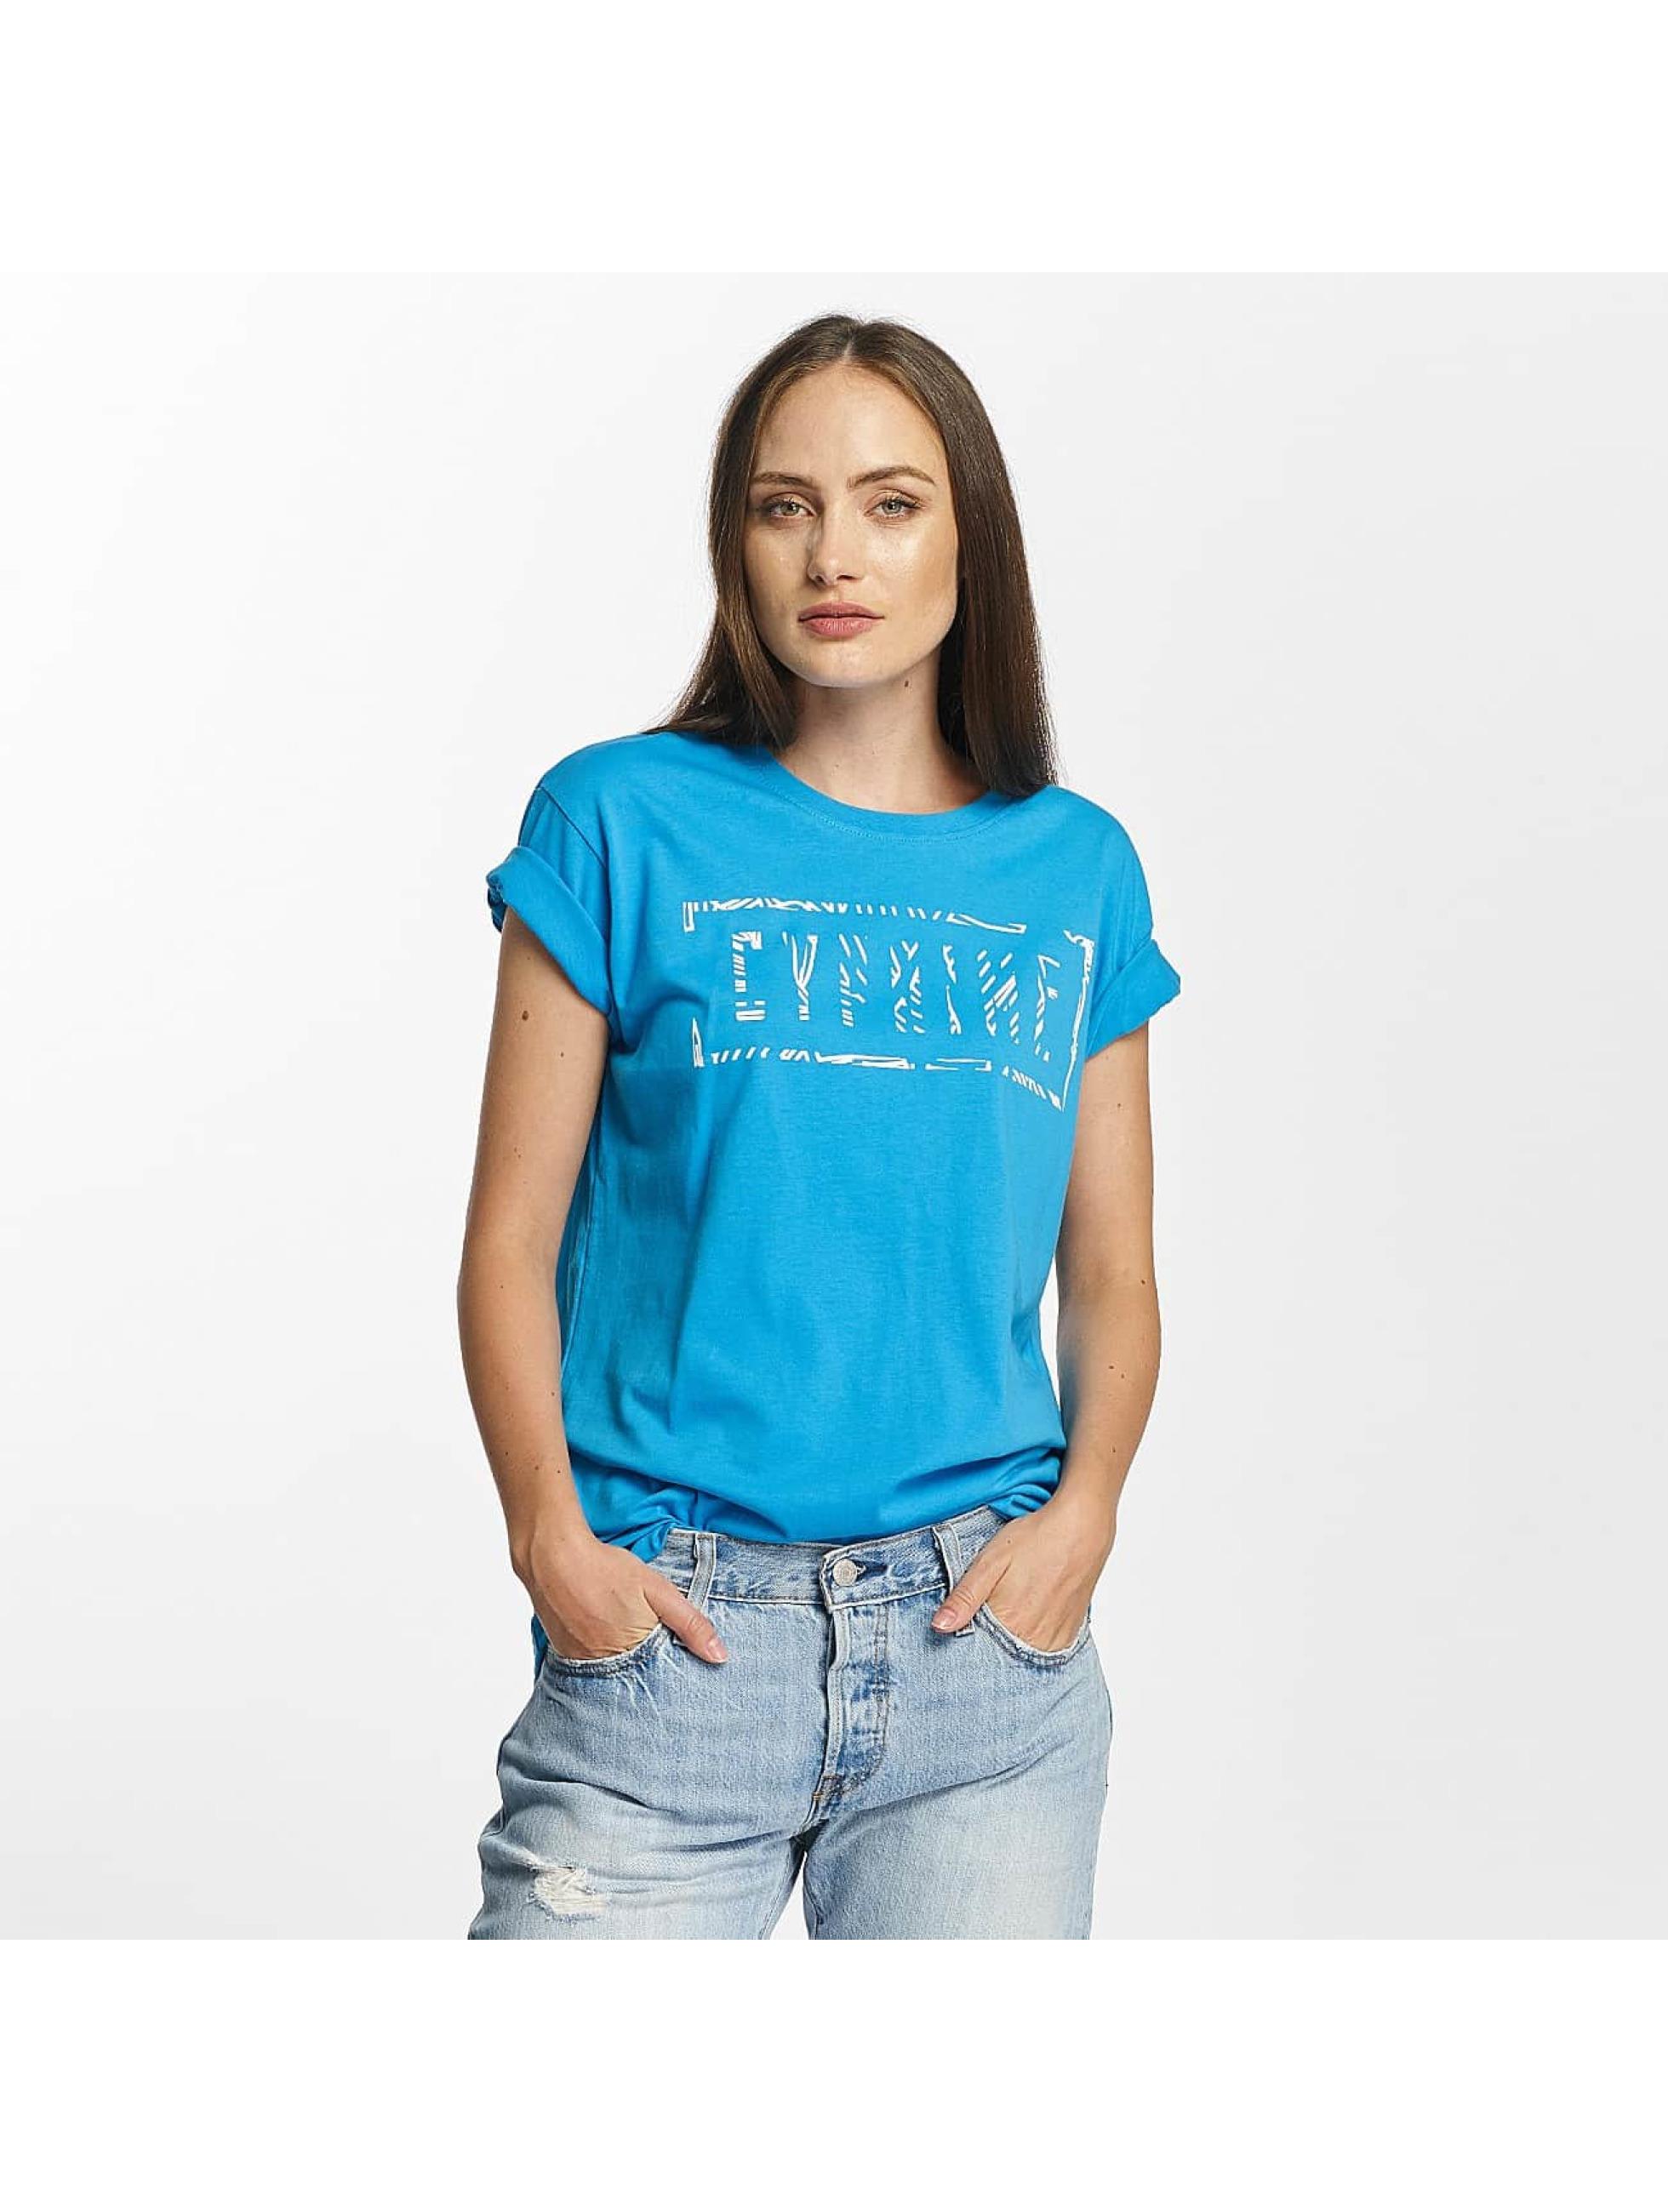 Cyprime Frauen T-Shirt Cerium Oversized in türkis